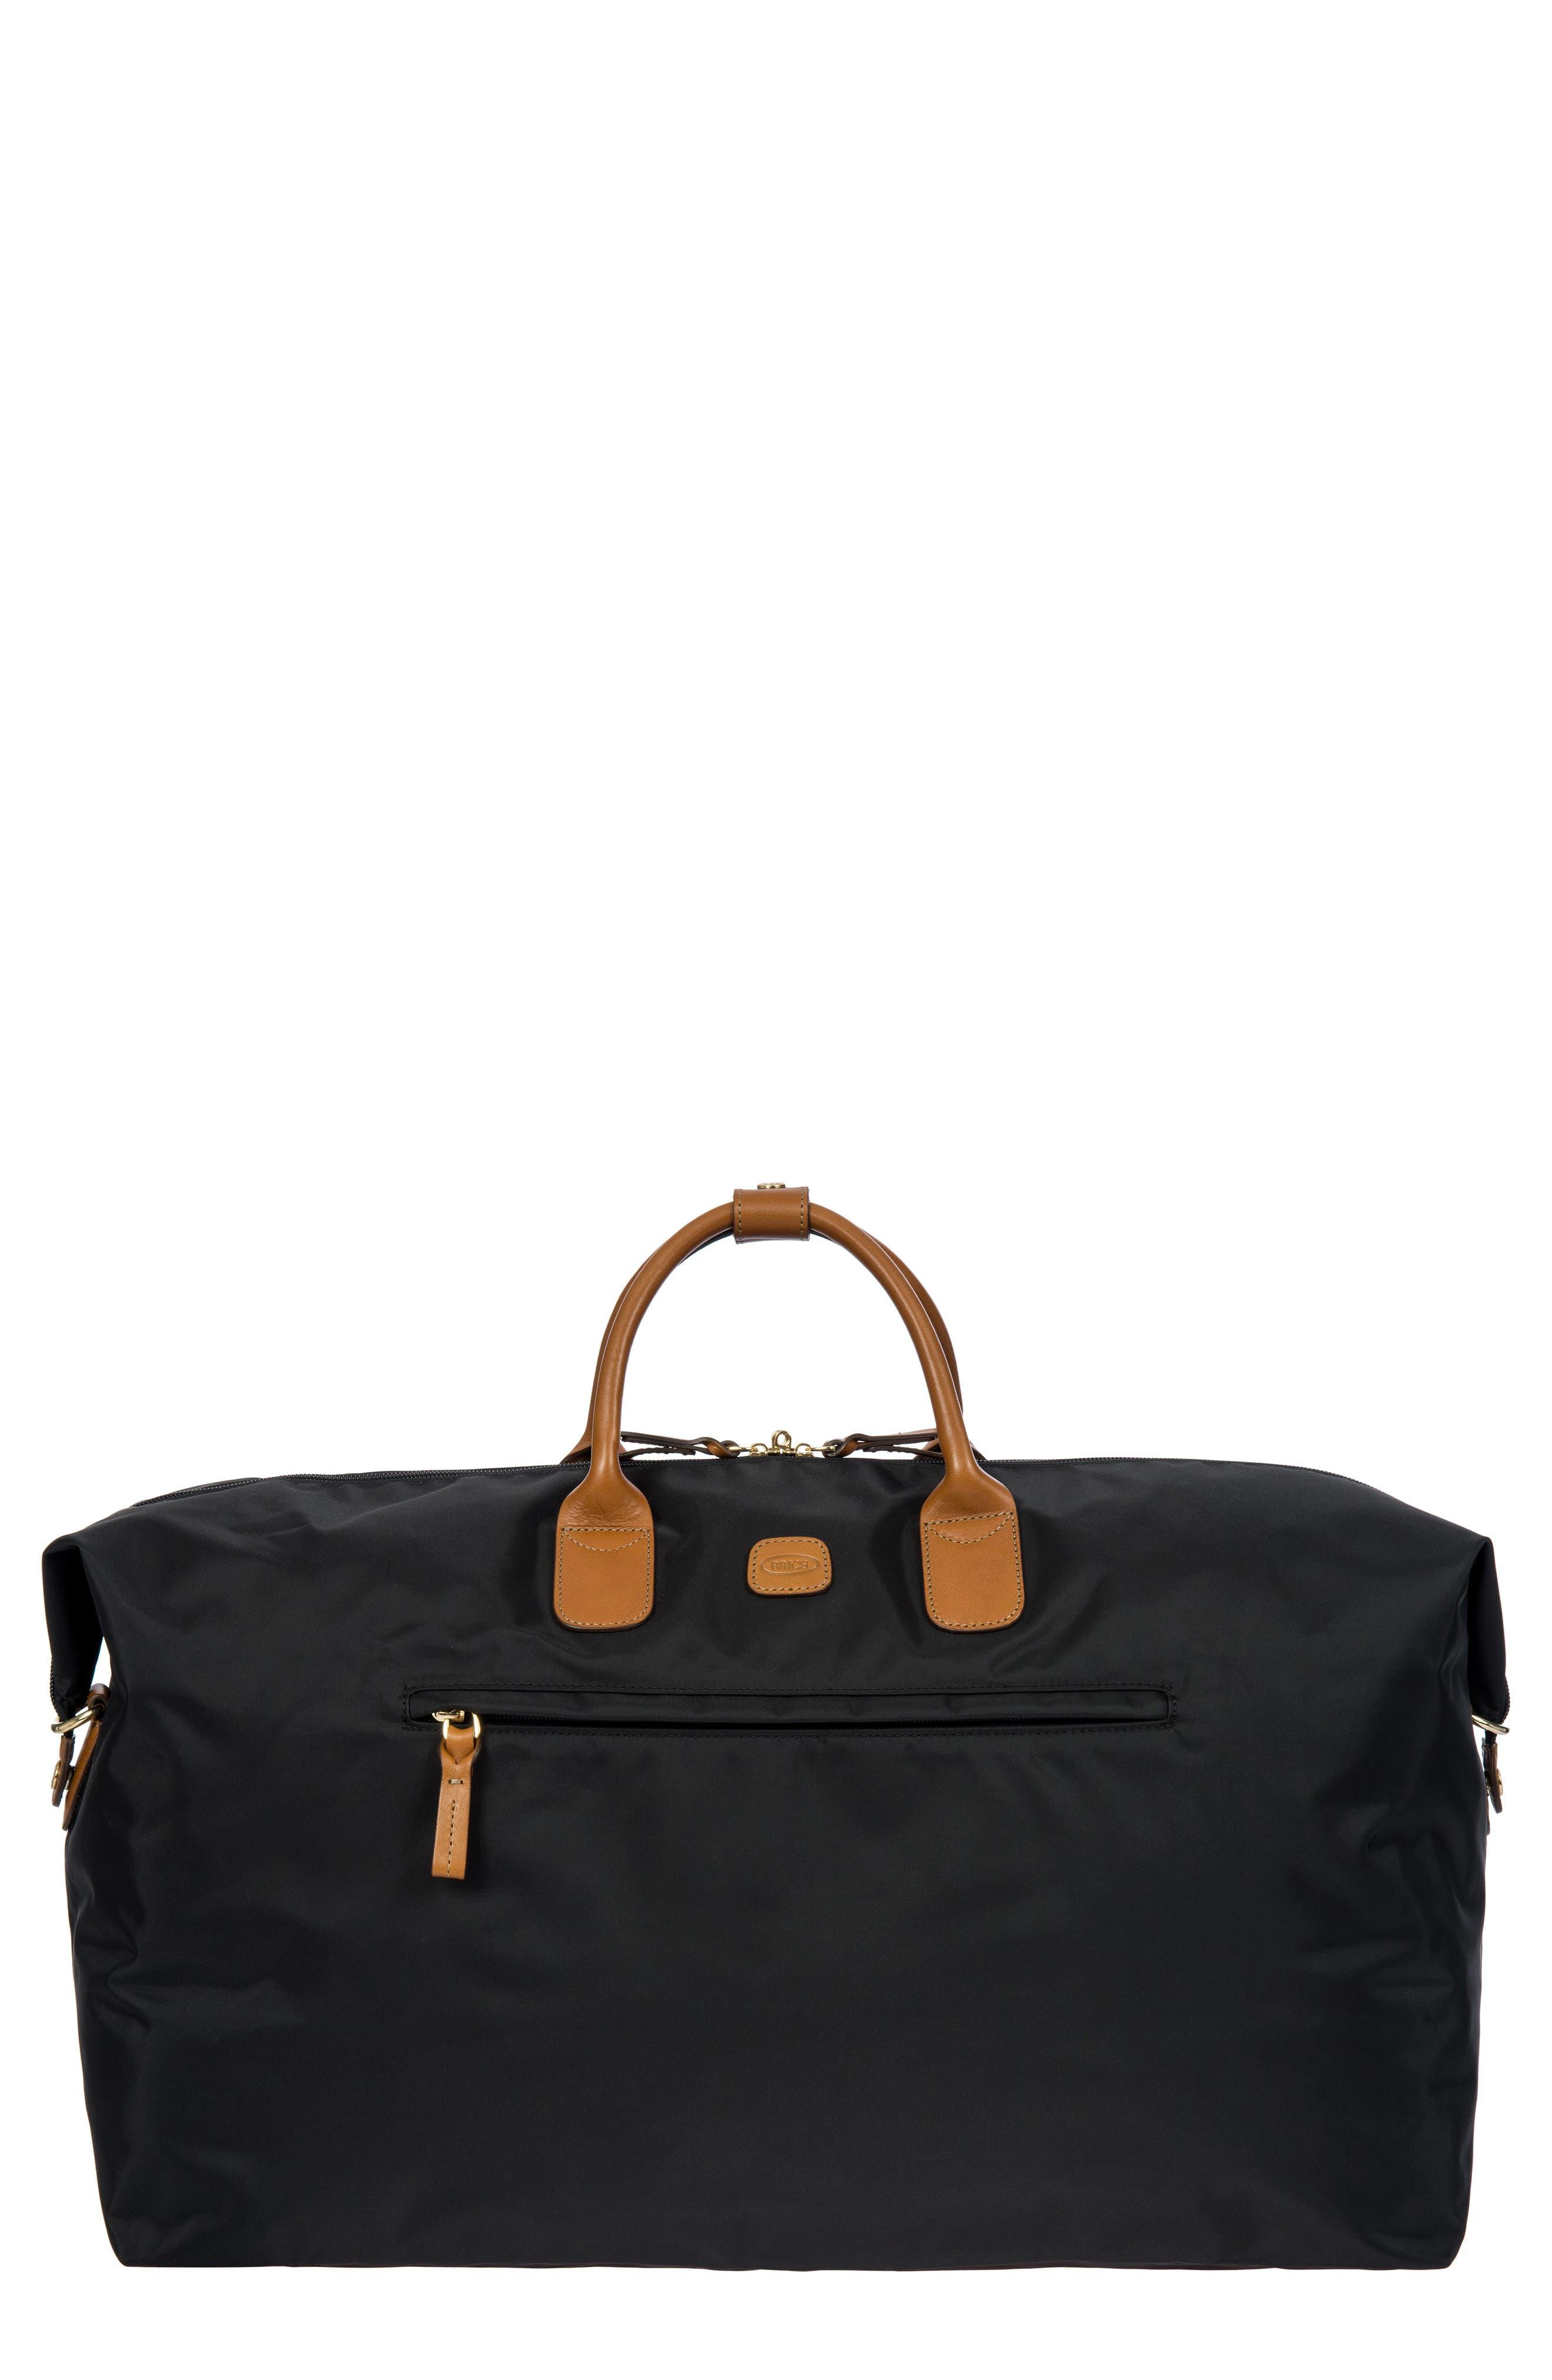 X-Bag Boarding 22-Inch Duffel Bag,                             Main thumbnail 1, color,                             BLACK